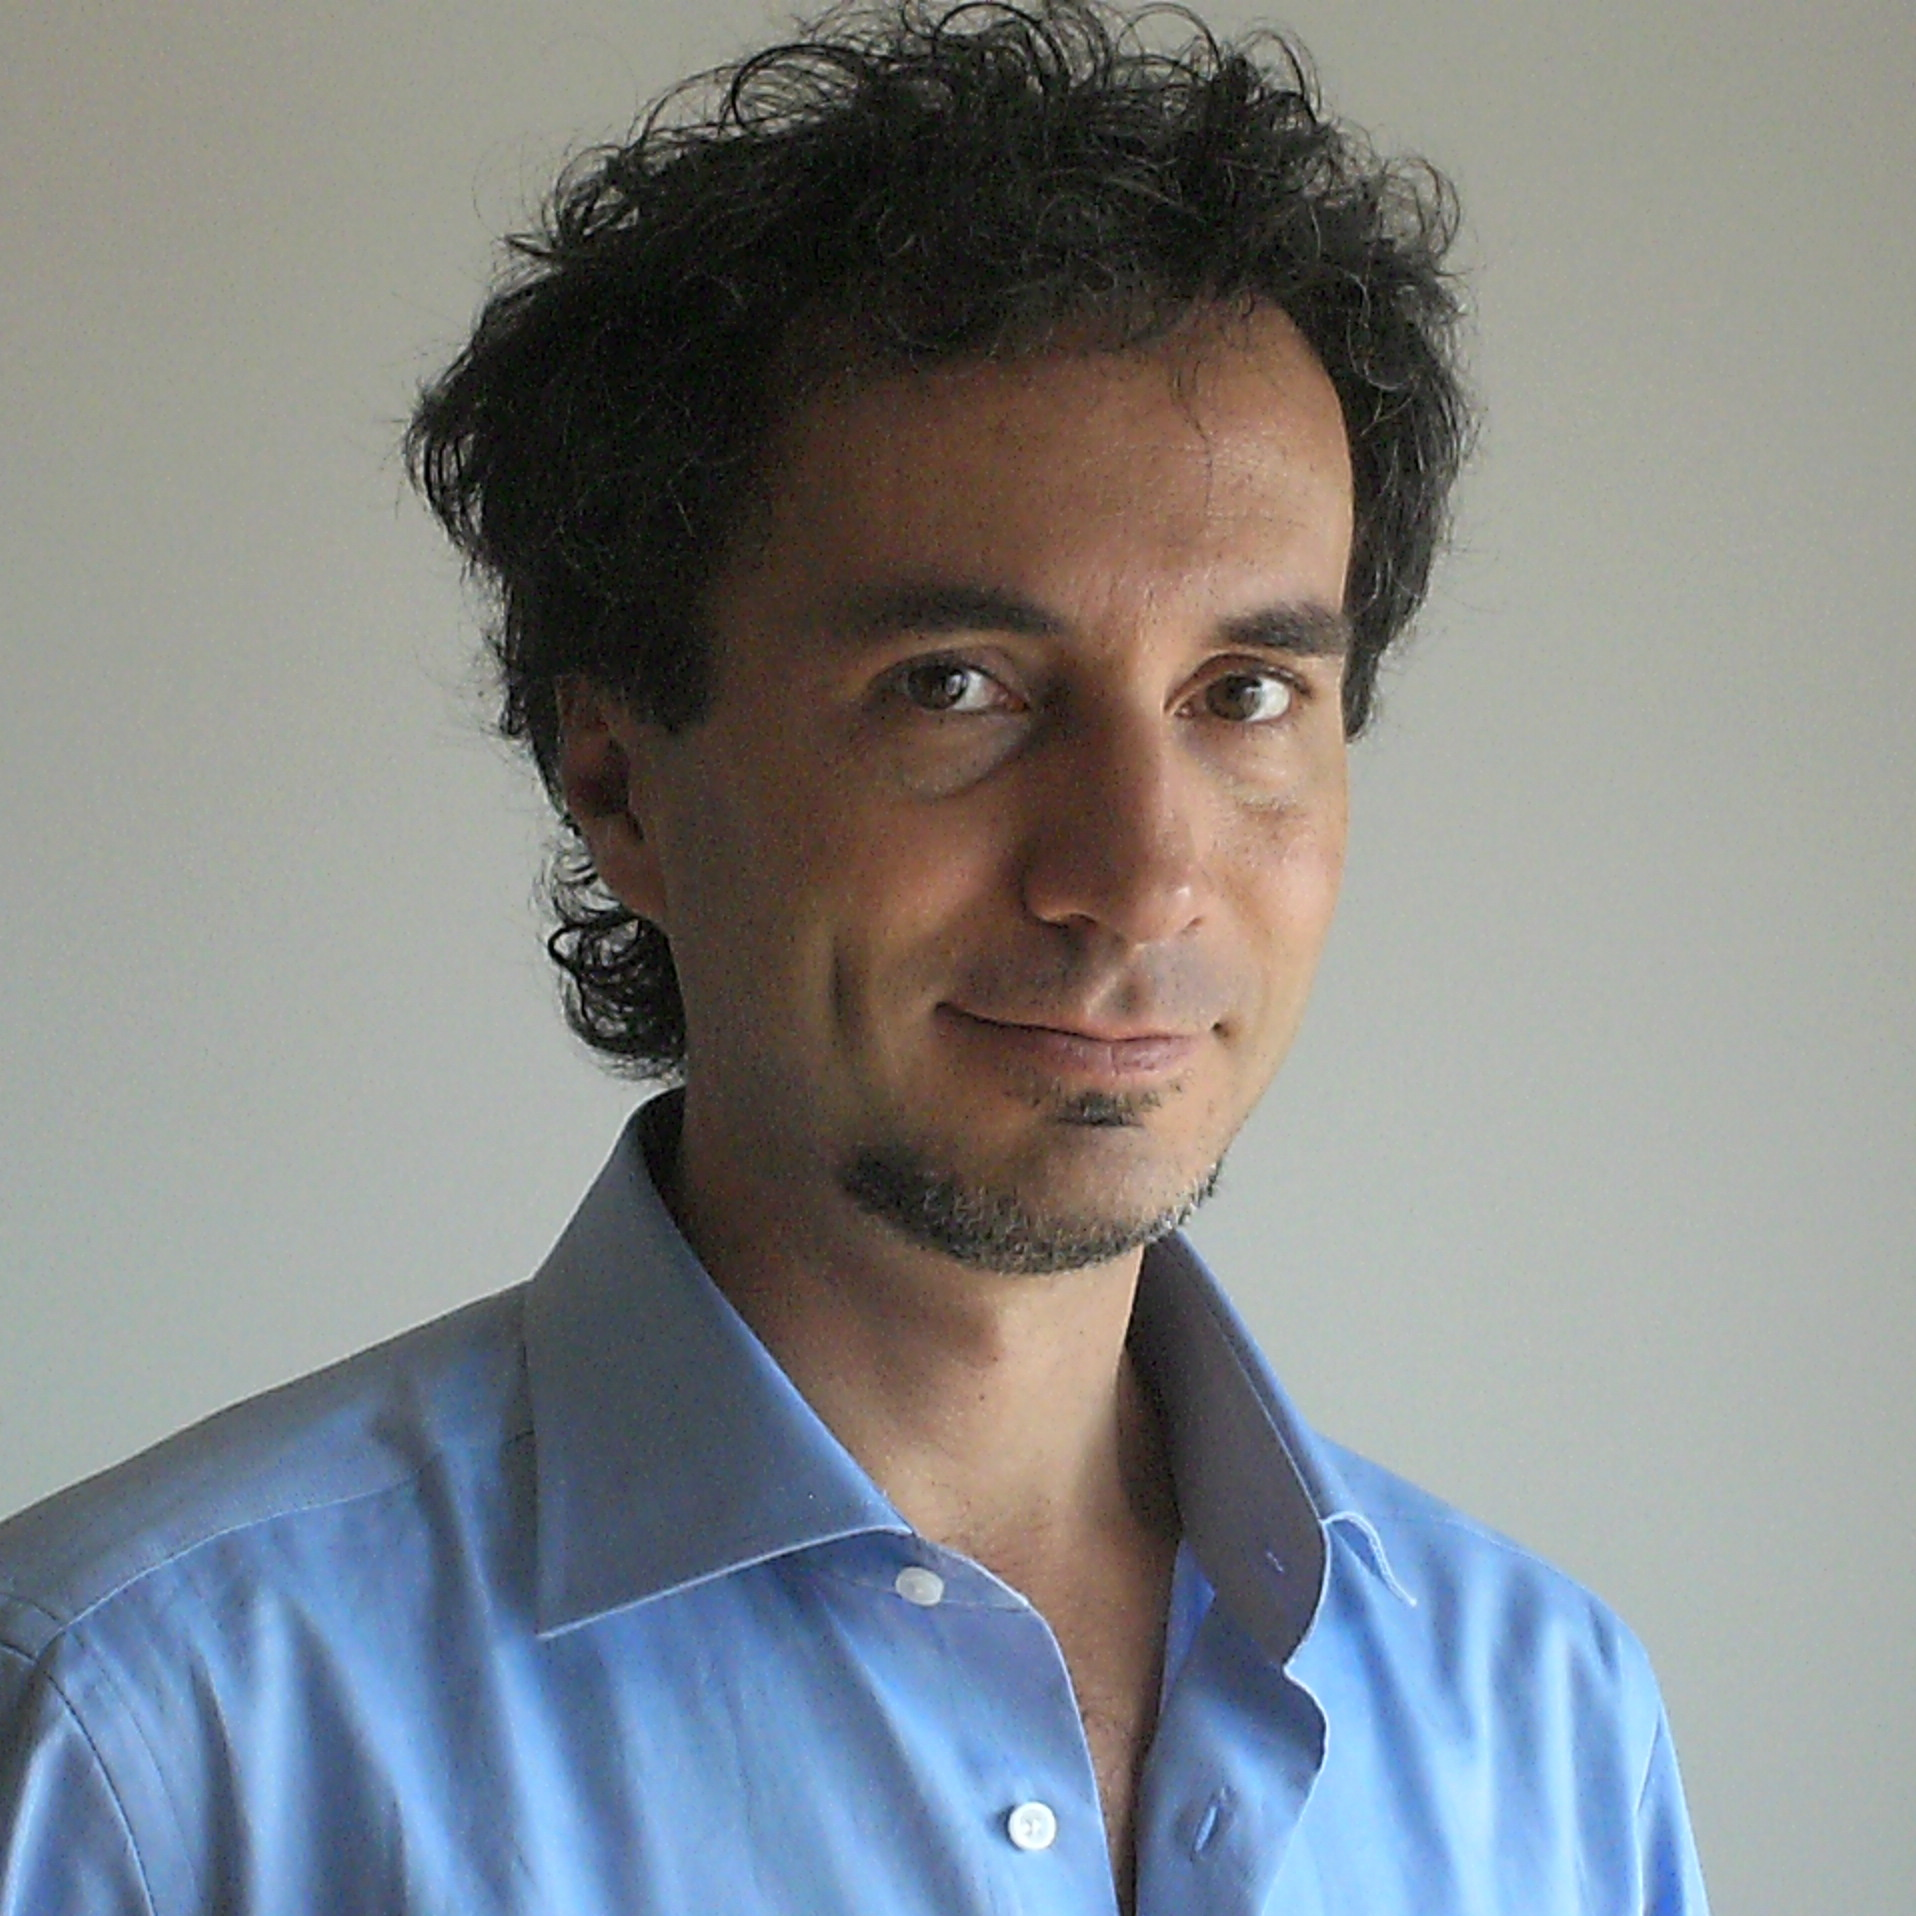 Alberto Pezzotta